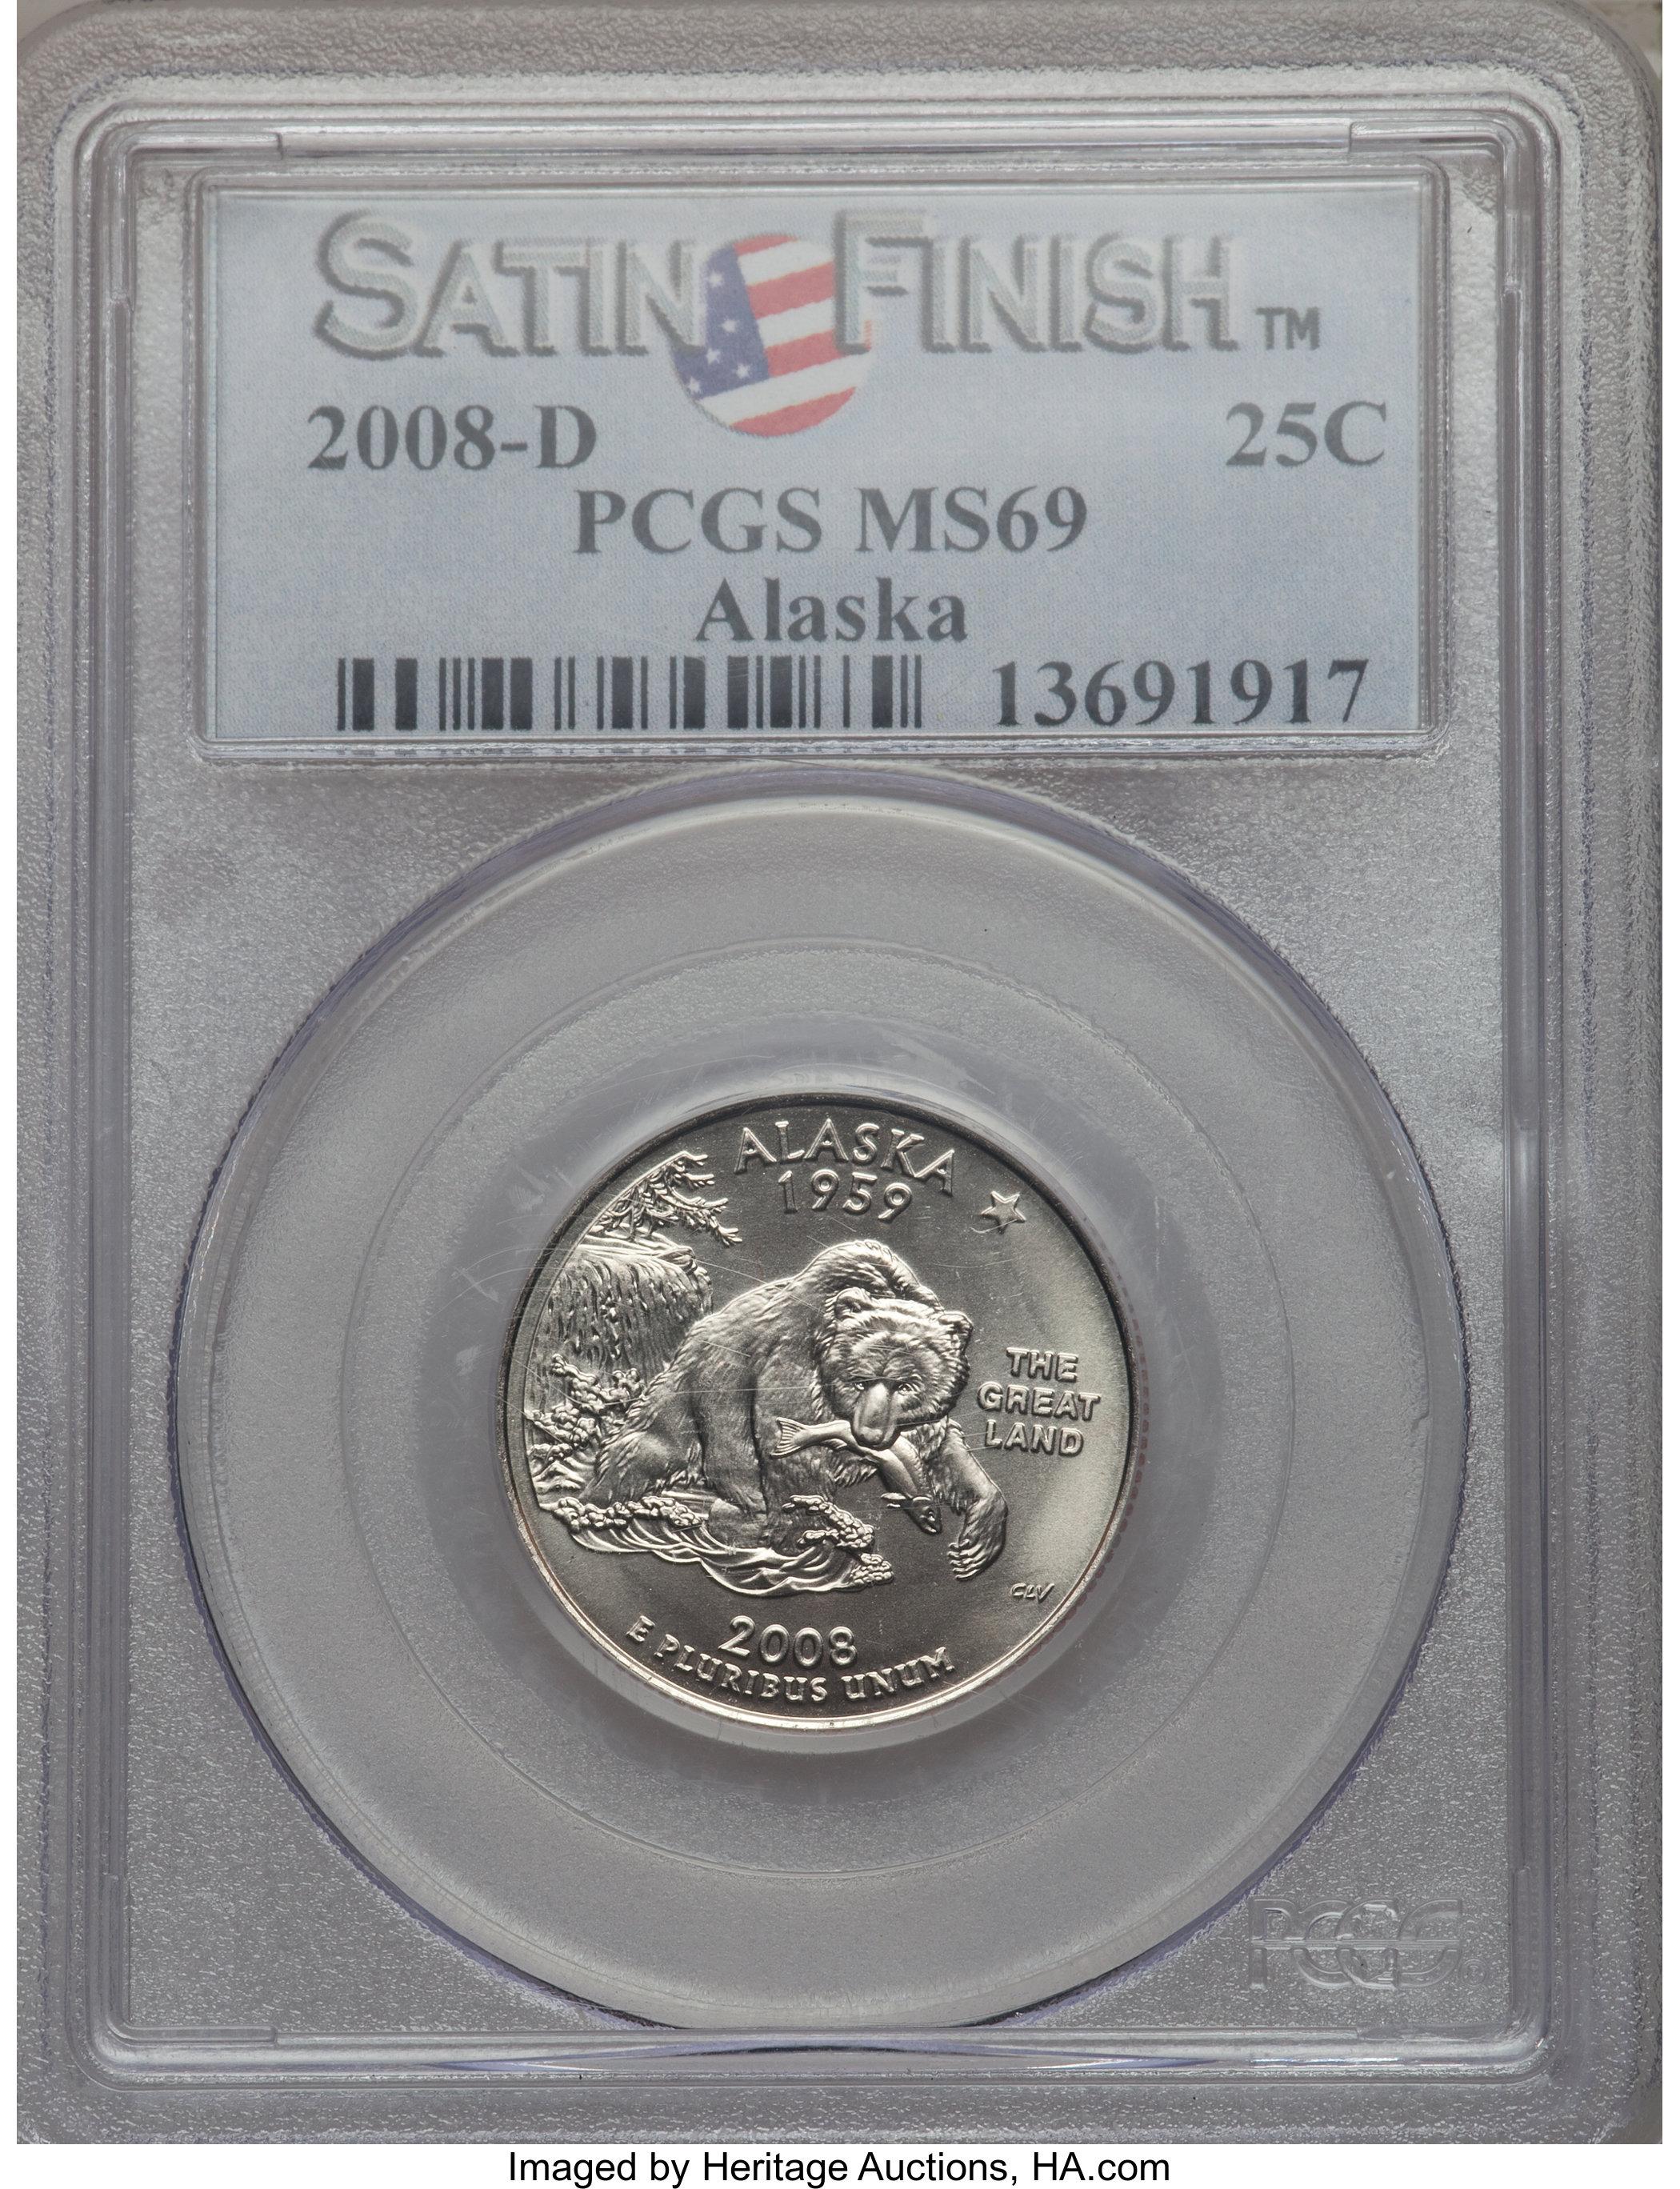 sample image for 2008-D Alaska 25c SP Satin Finish